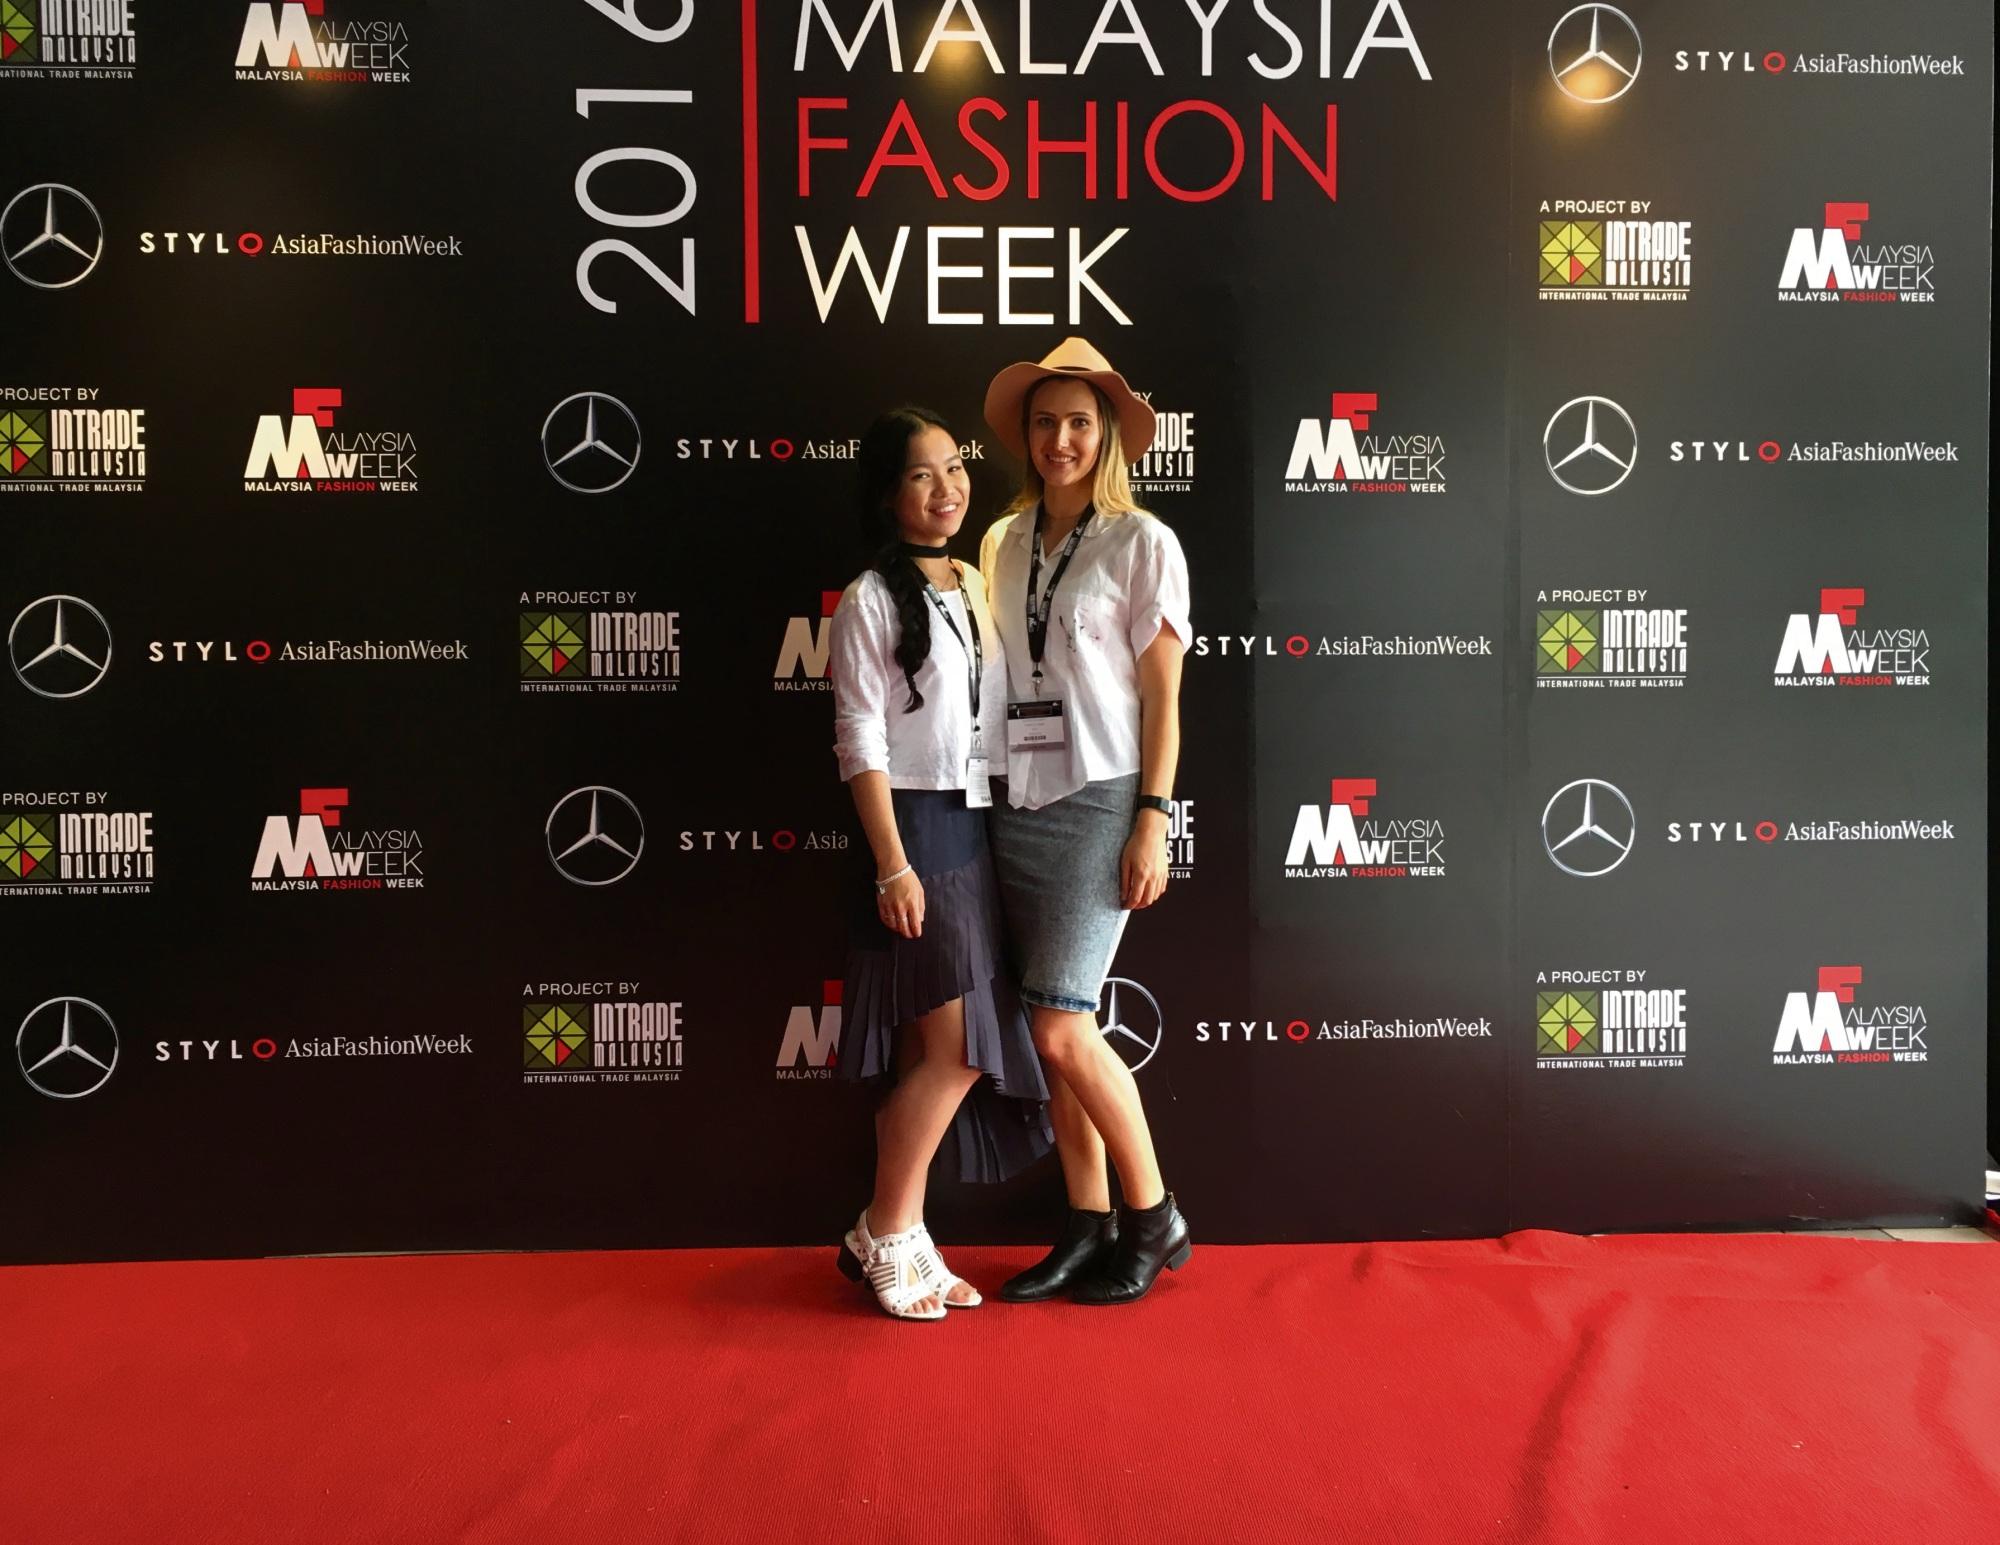 Wilson fashion design student displays wares at Asia Fashion Week